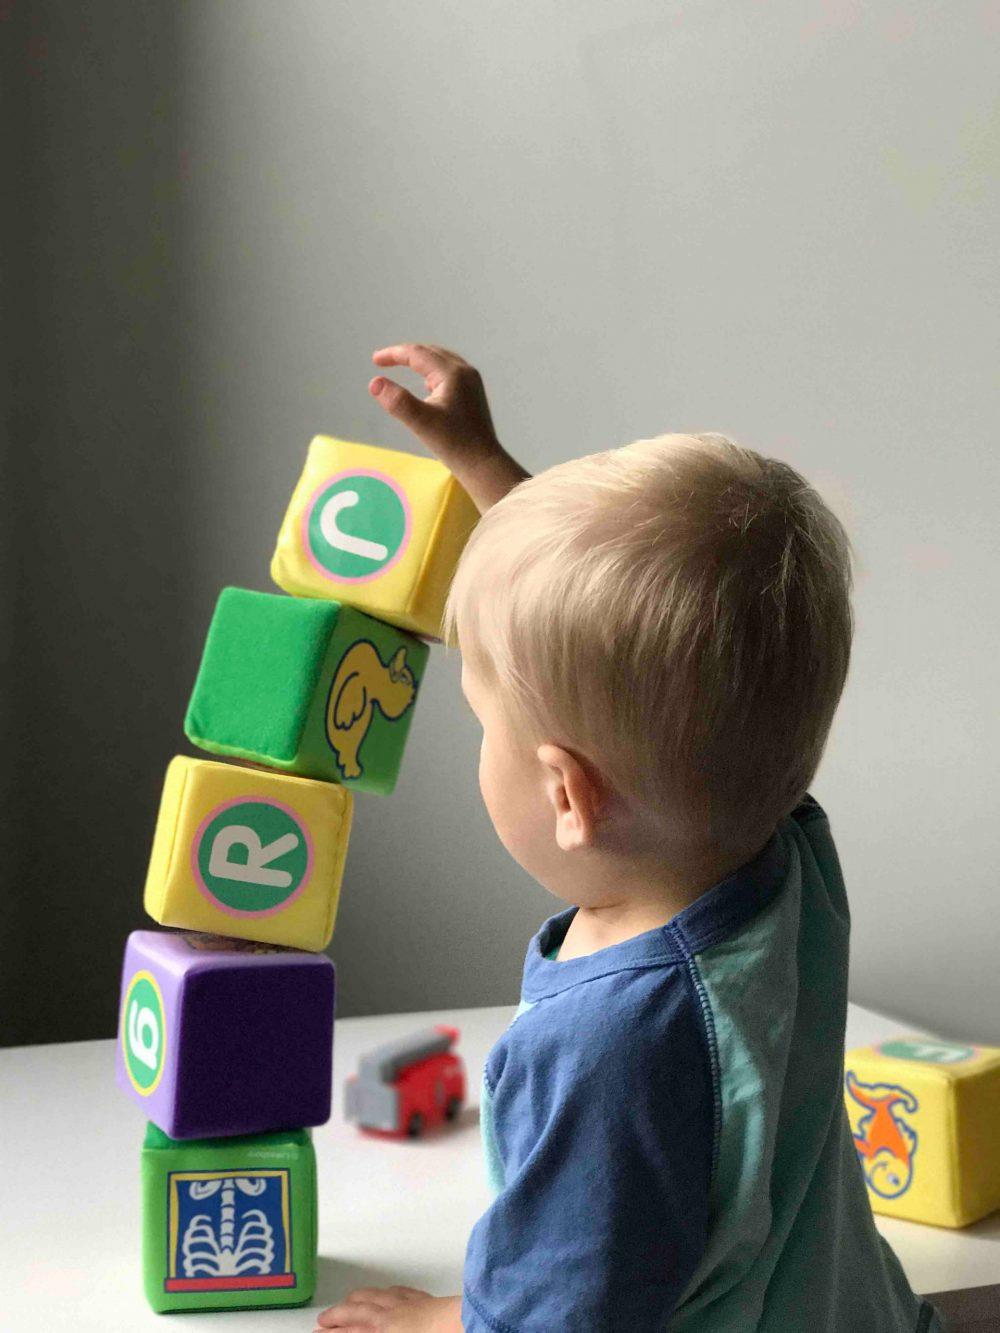 A child playing with blocks - Scottish News